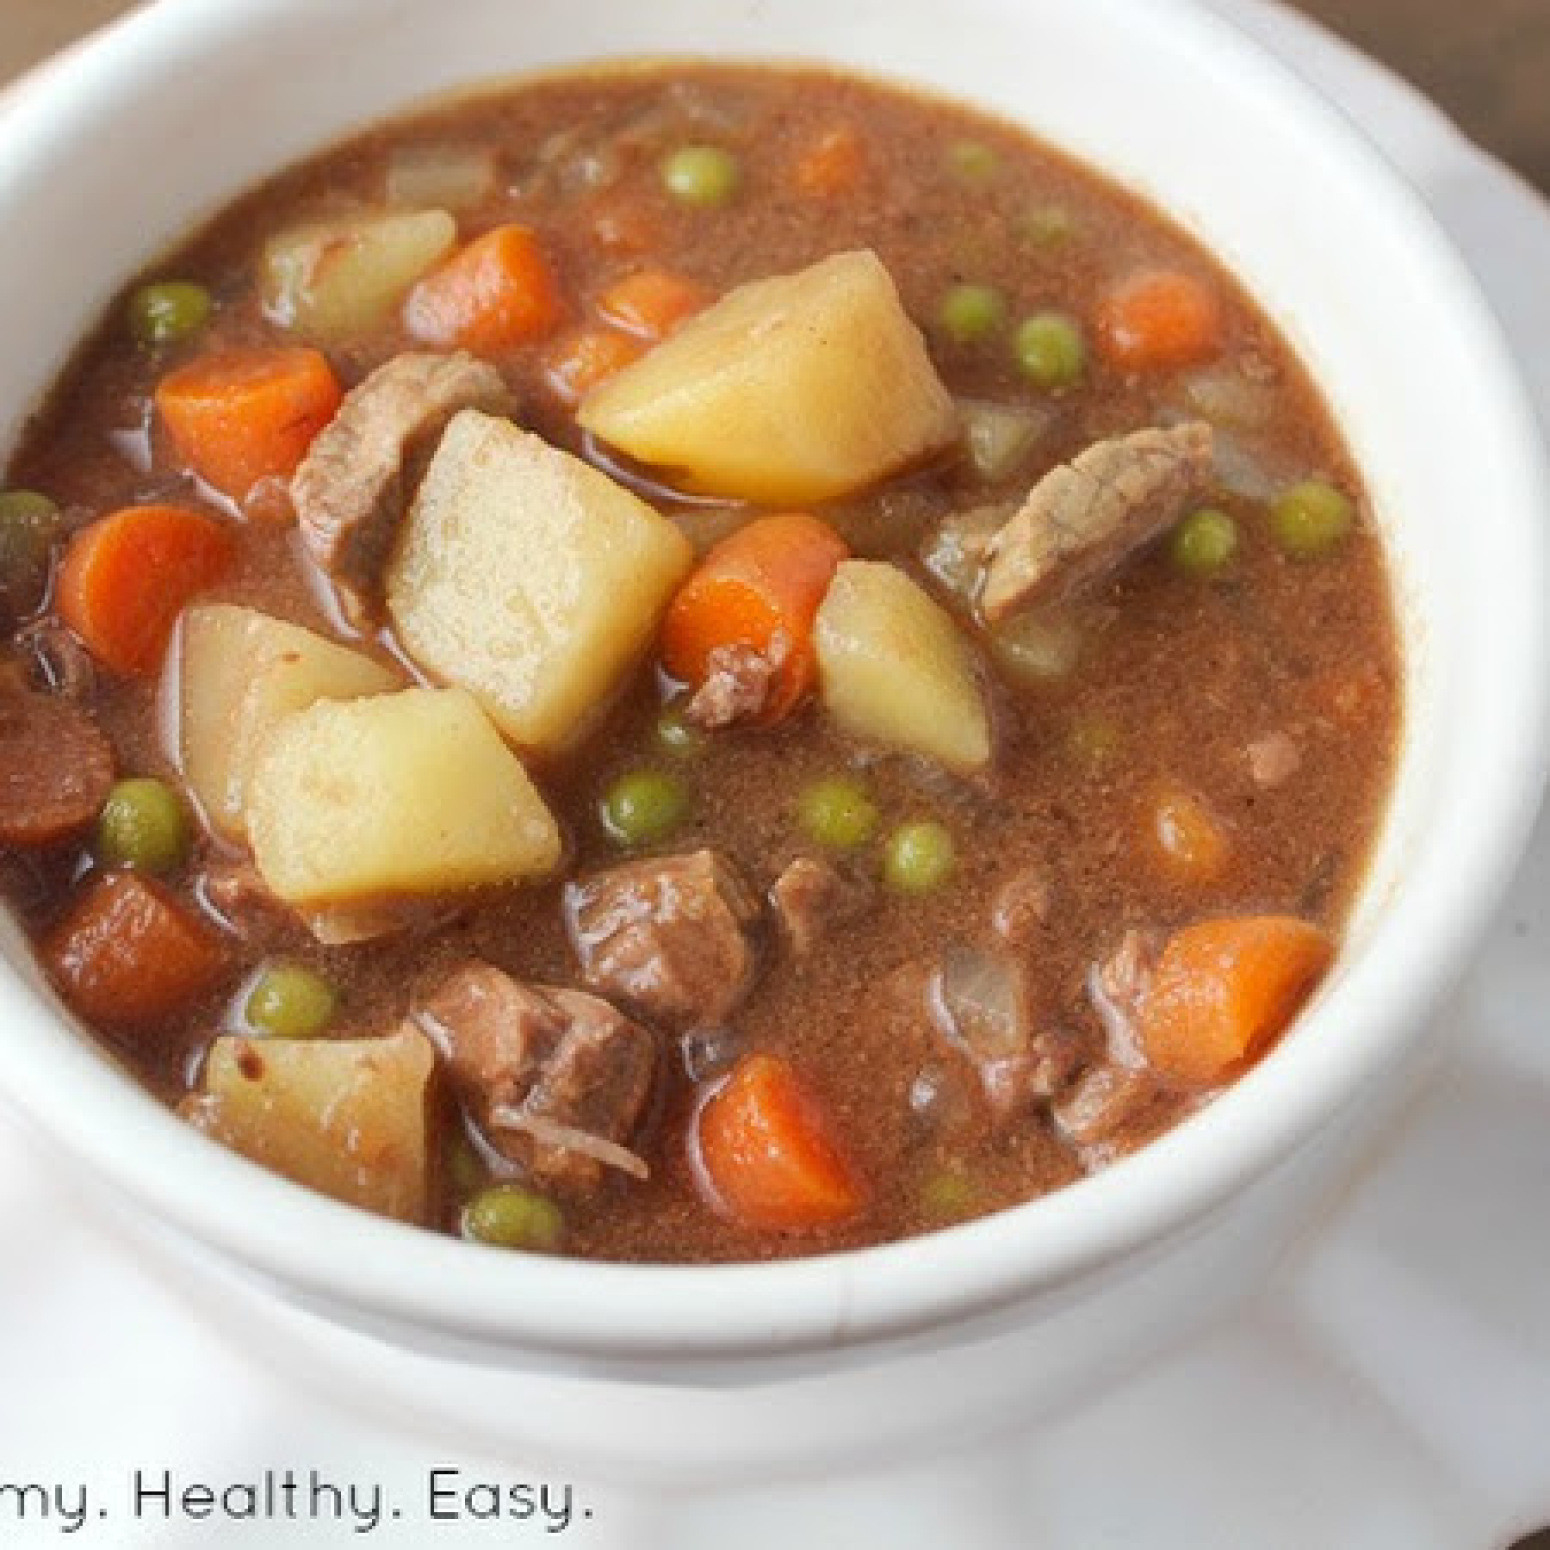 Crock Pot Beef Stew Recipes  Simple Crock Pot Beef Stew Recipe